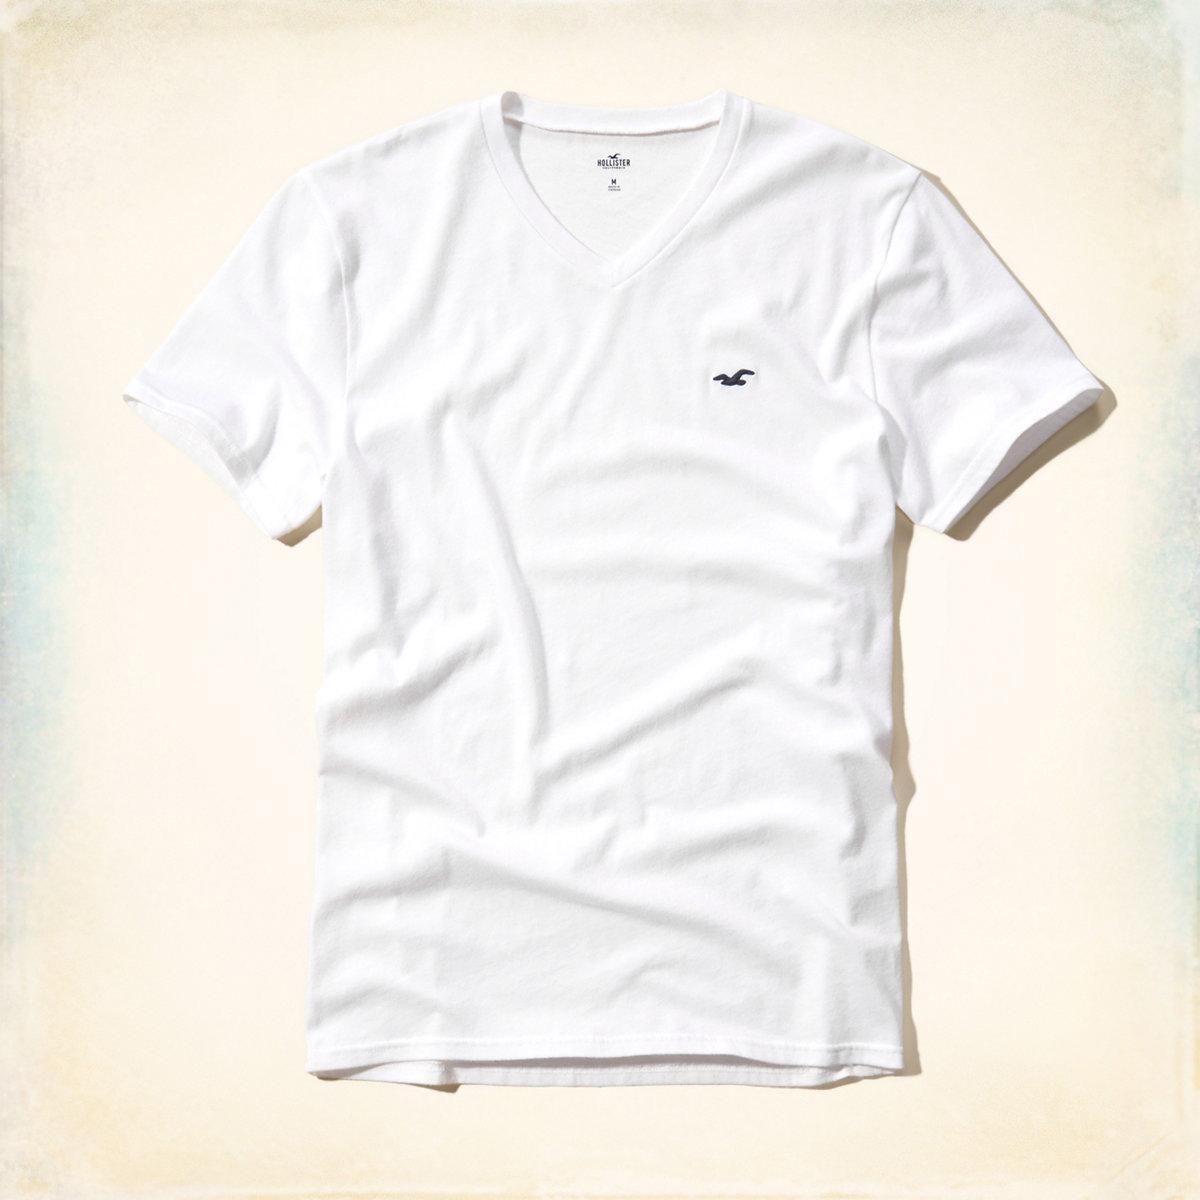 美國百分百【Hollister Co.】T恤 HCO 短袖 T-shirt 海鷗 白色 素T logo V領 S號 E956